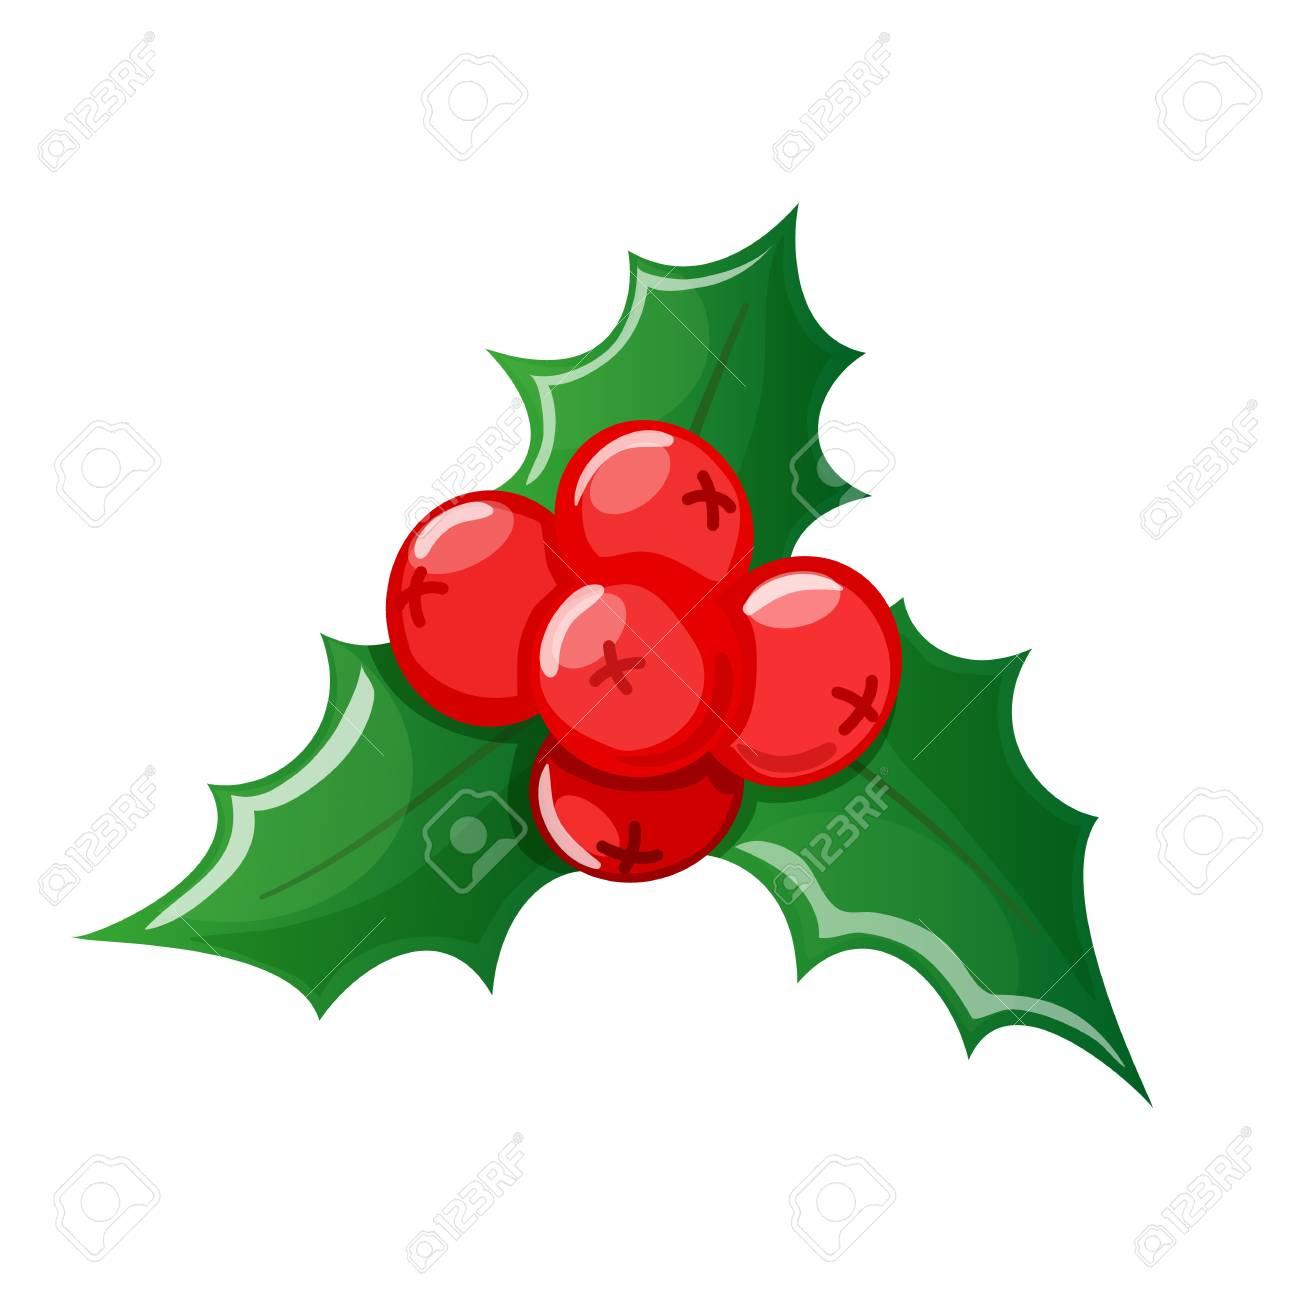 Christmas Holly Cartoon.Christmas Cartoon Colorful Holly On A White Background Vector